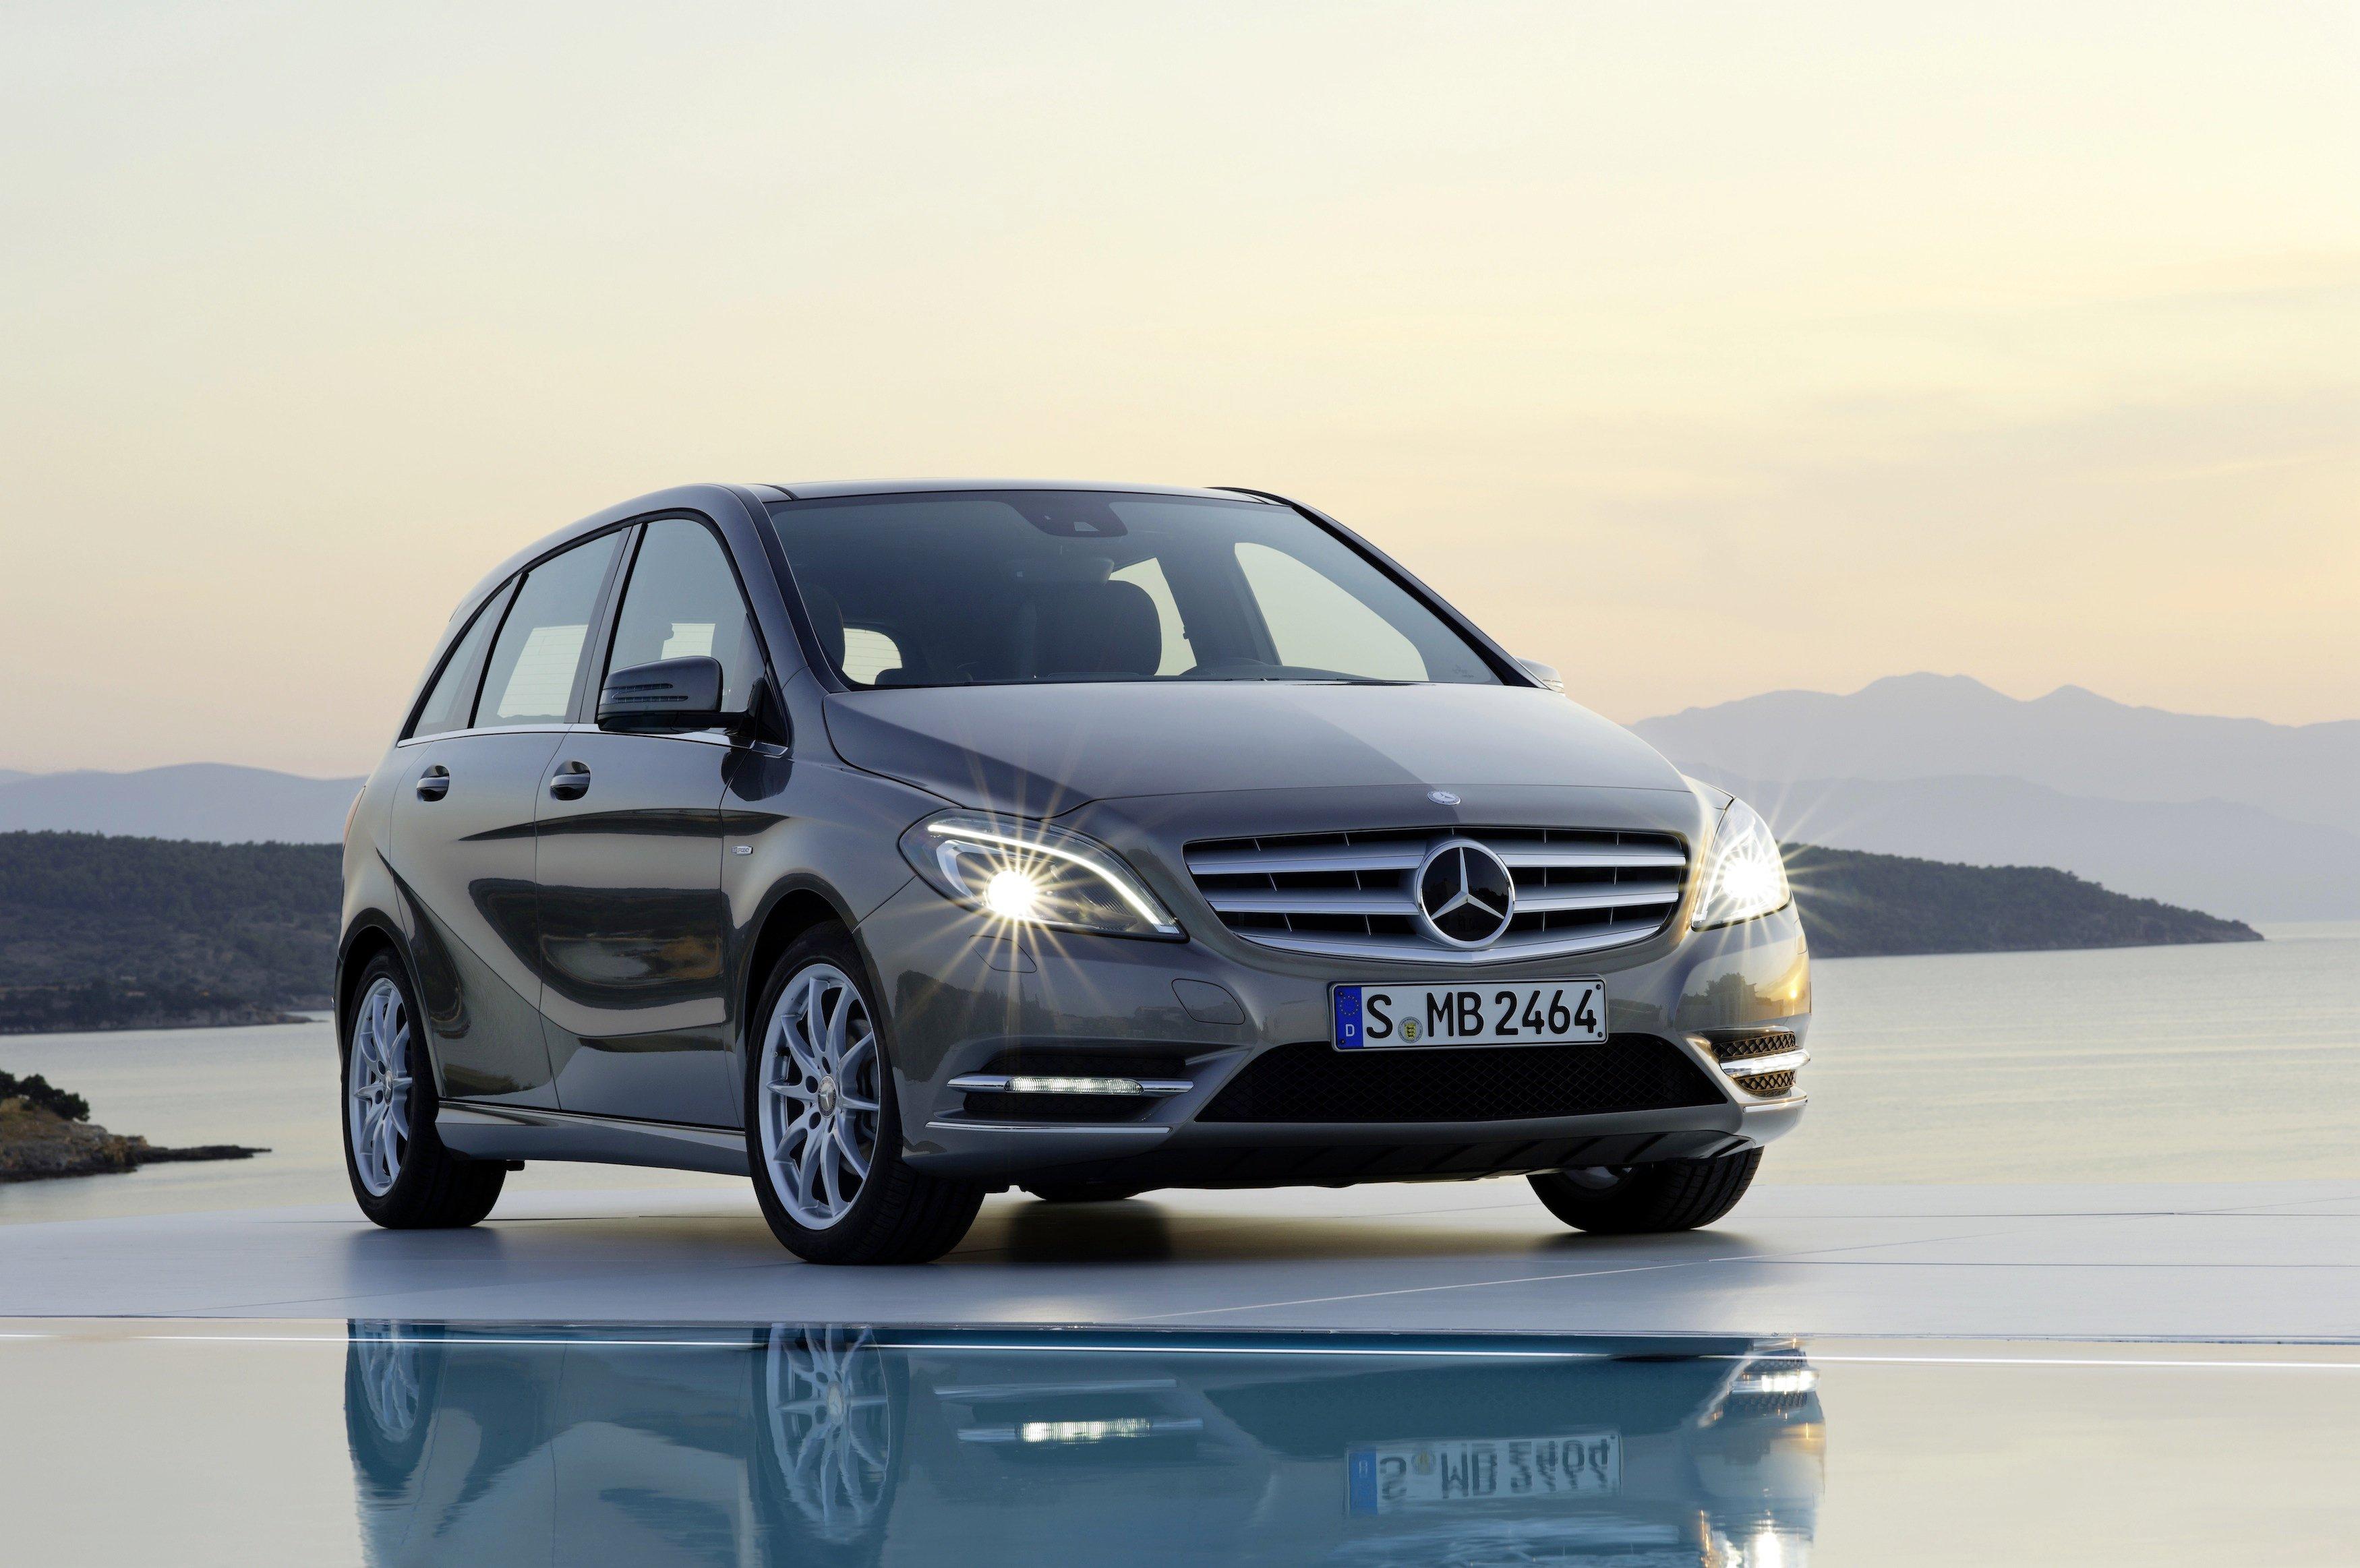 Mercedes-Benz B-Class: Review - Photos | CarAdvice